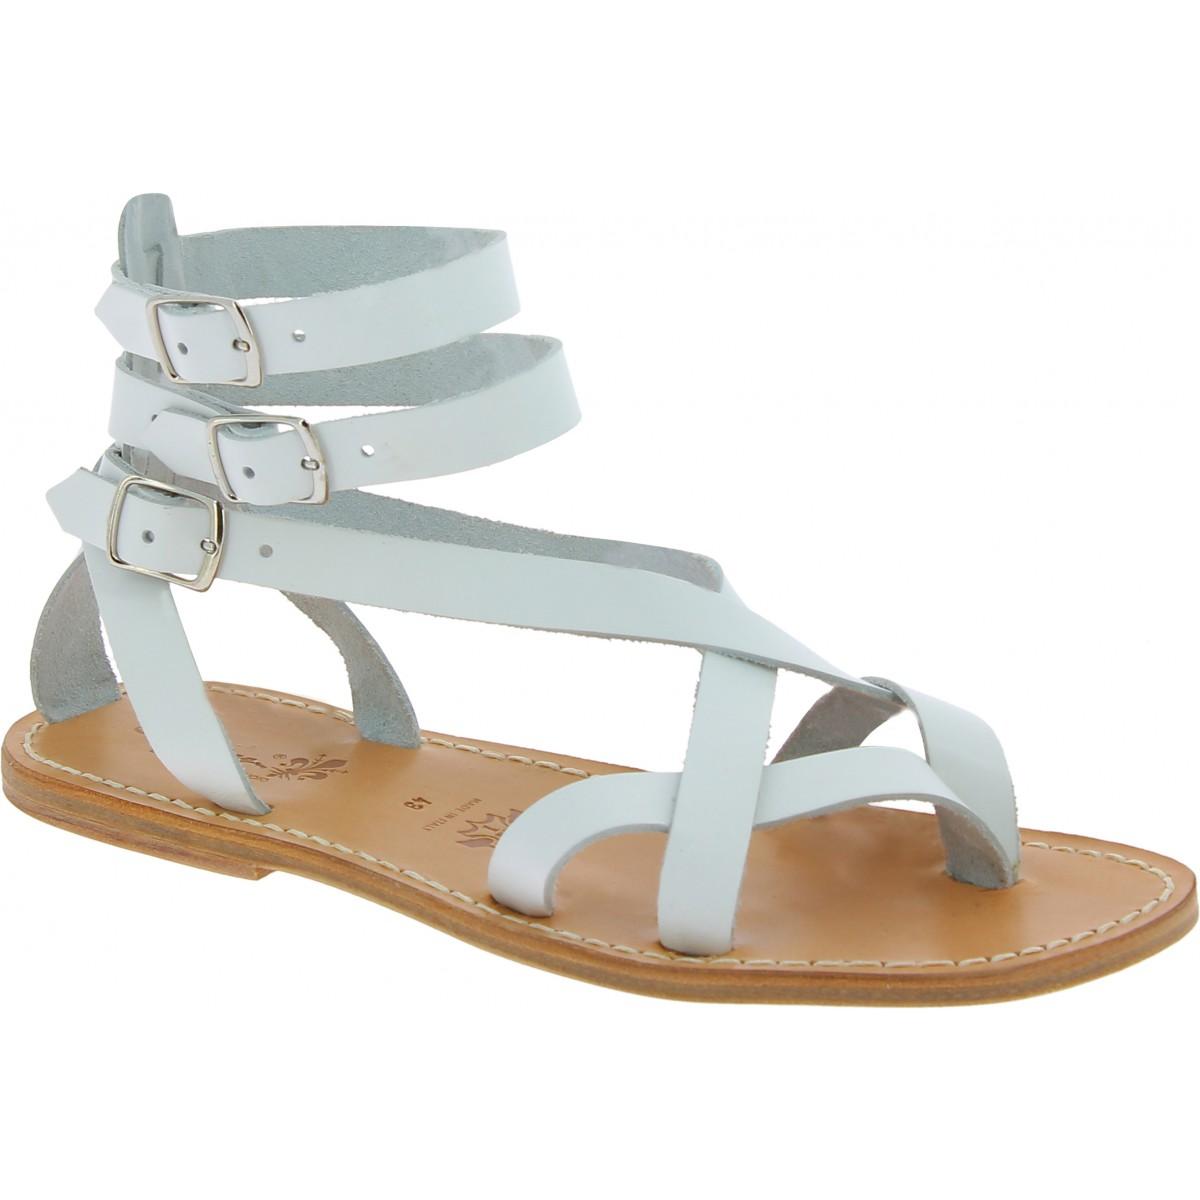 gladiator sandals Handmade in Italy